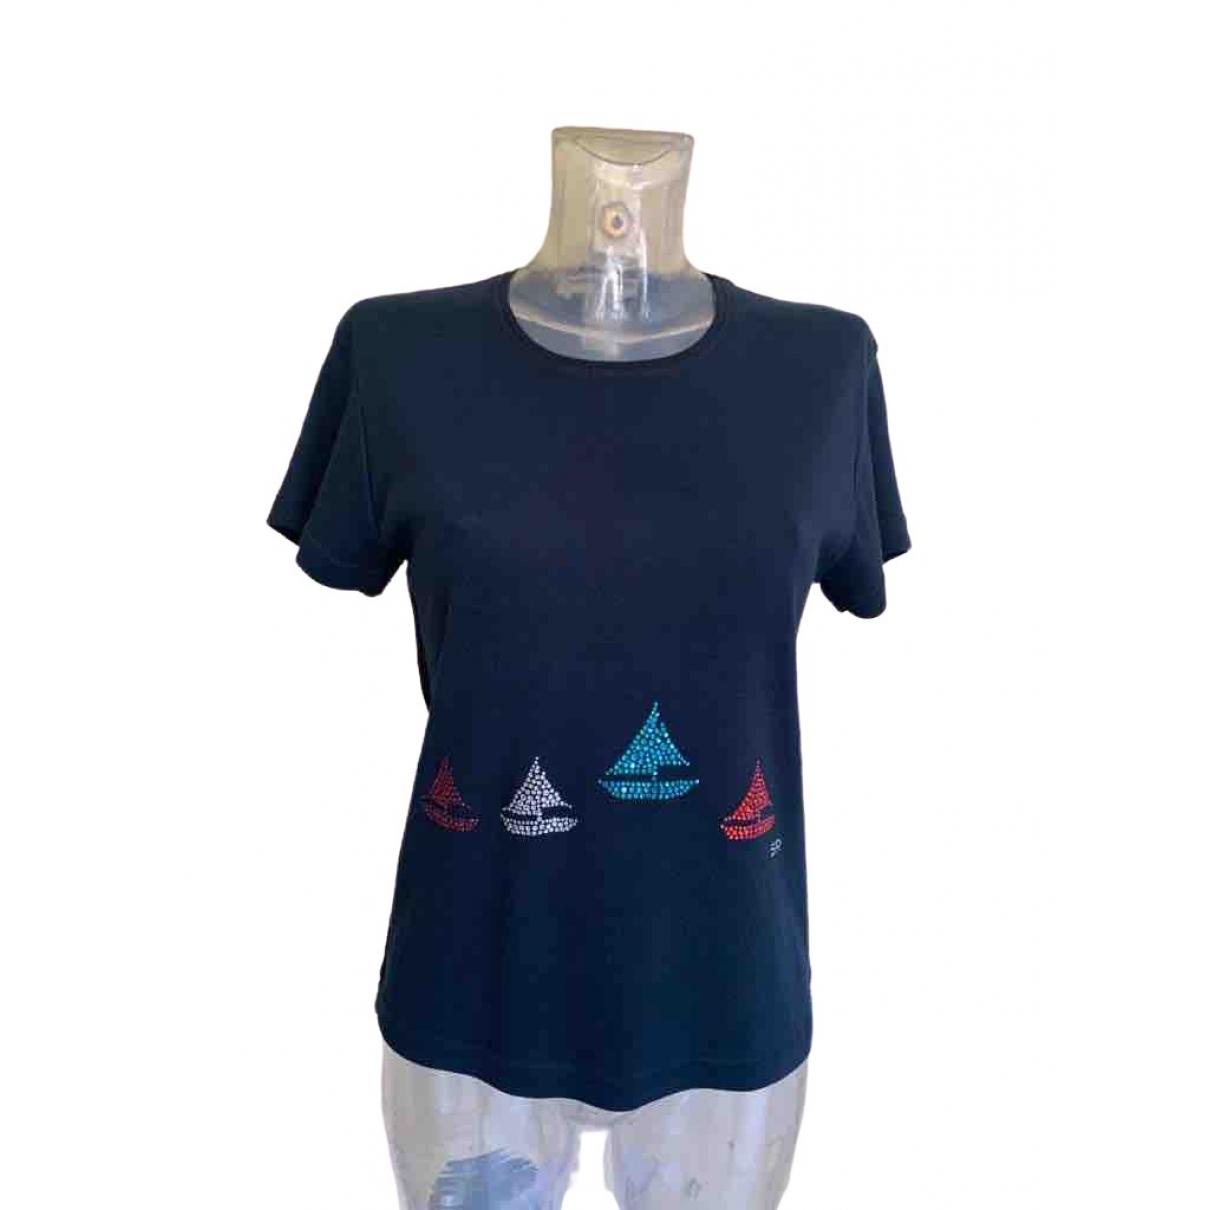 Camiseta Sonia Rykiel